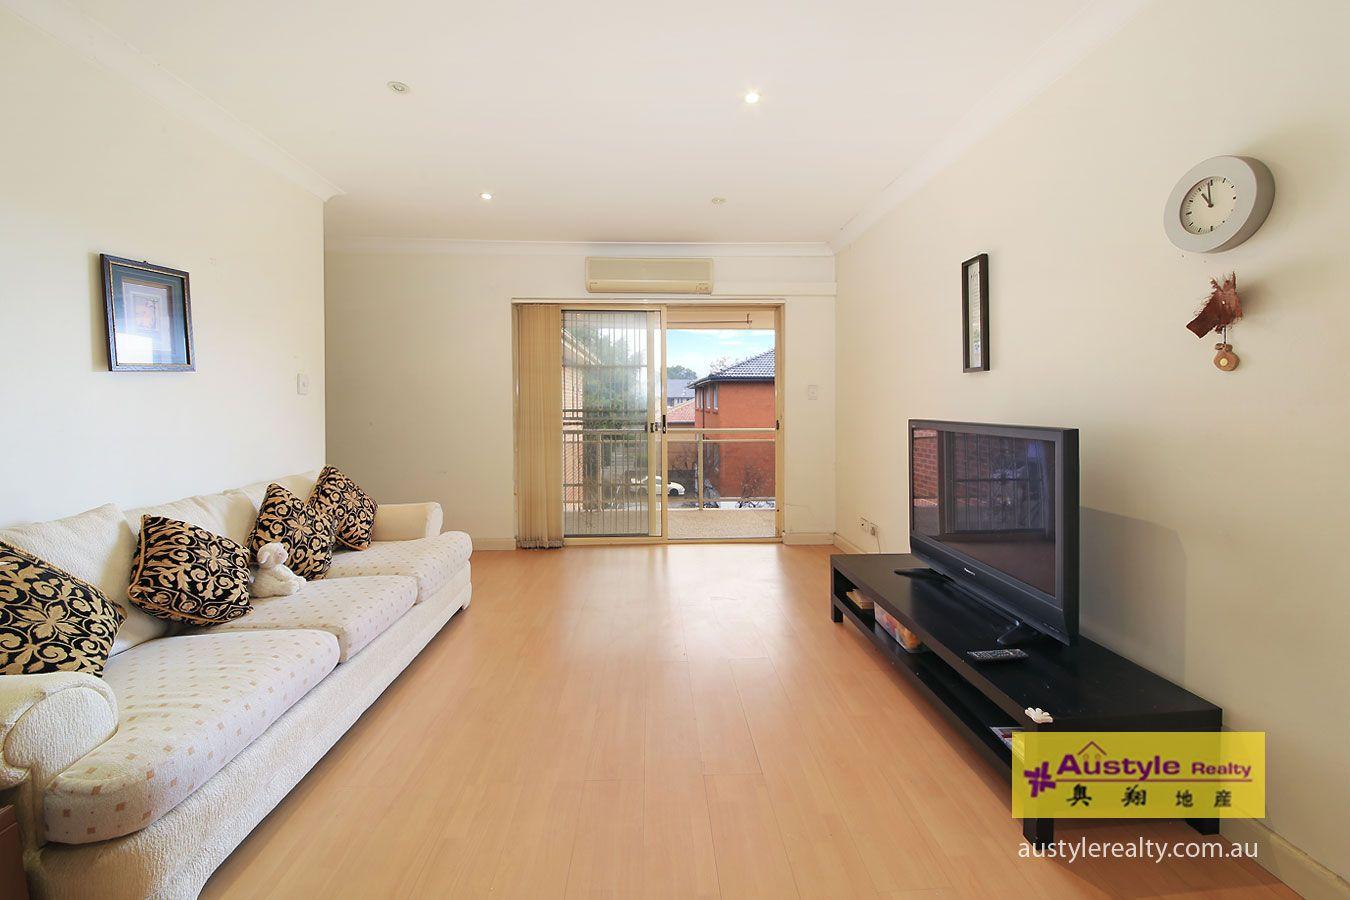 10/46-48 Prospect St, Rosehill NSW 2142, Image 1